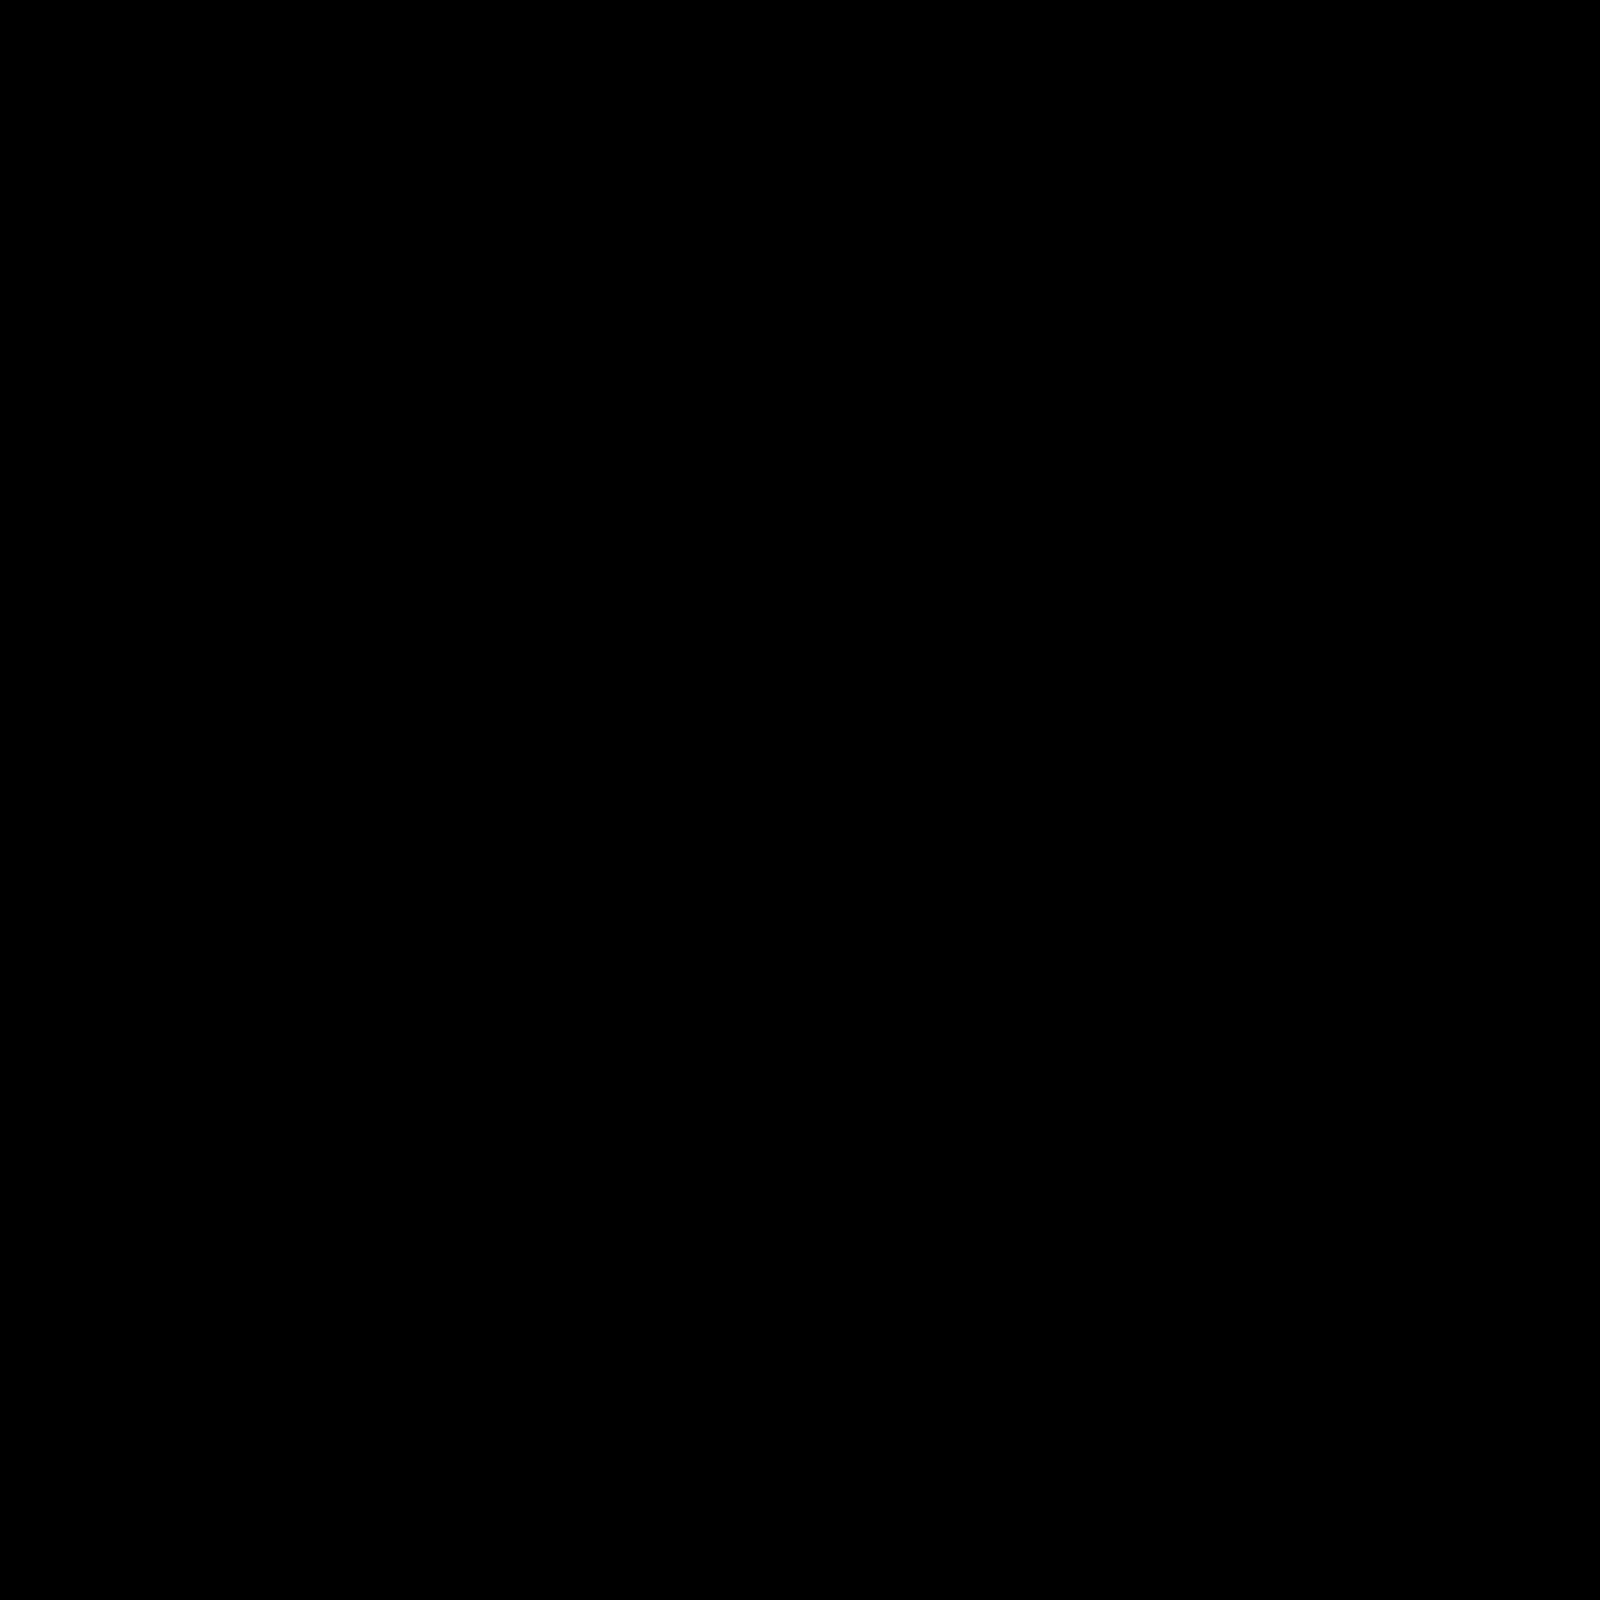 Meksyk Mapa icon